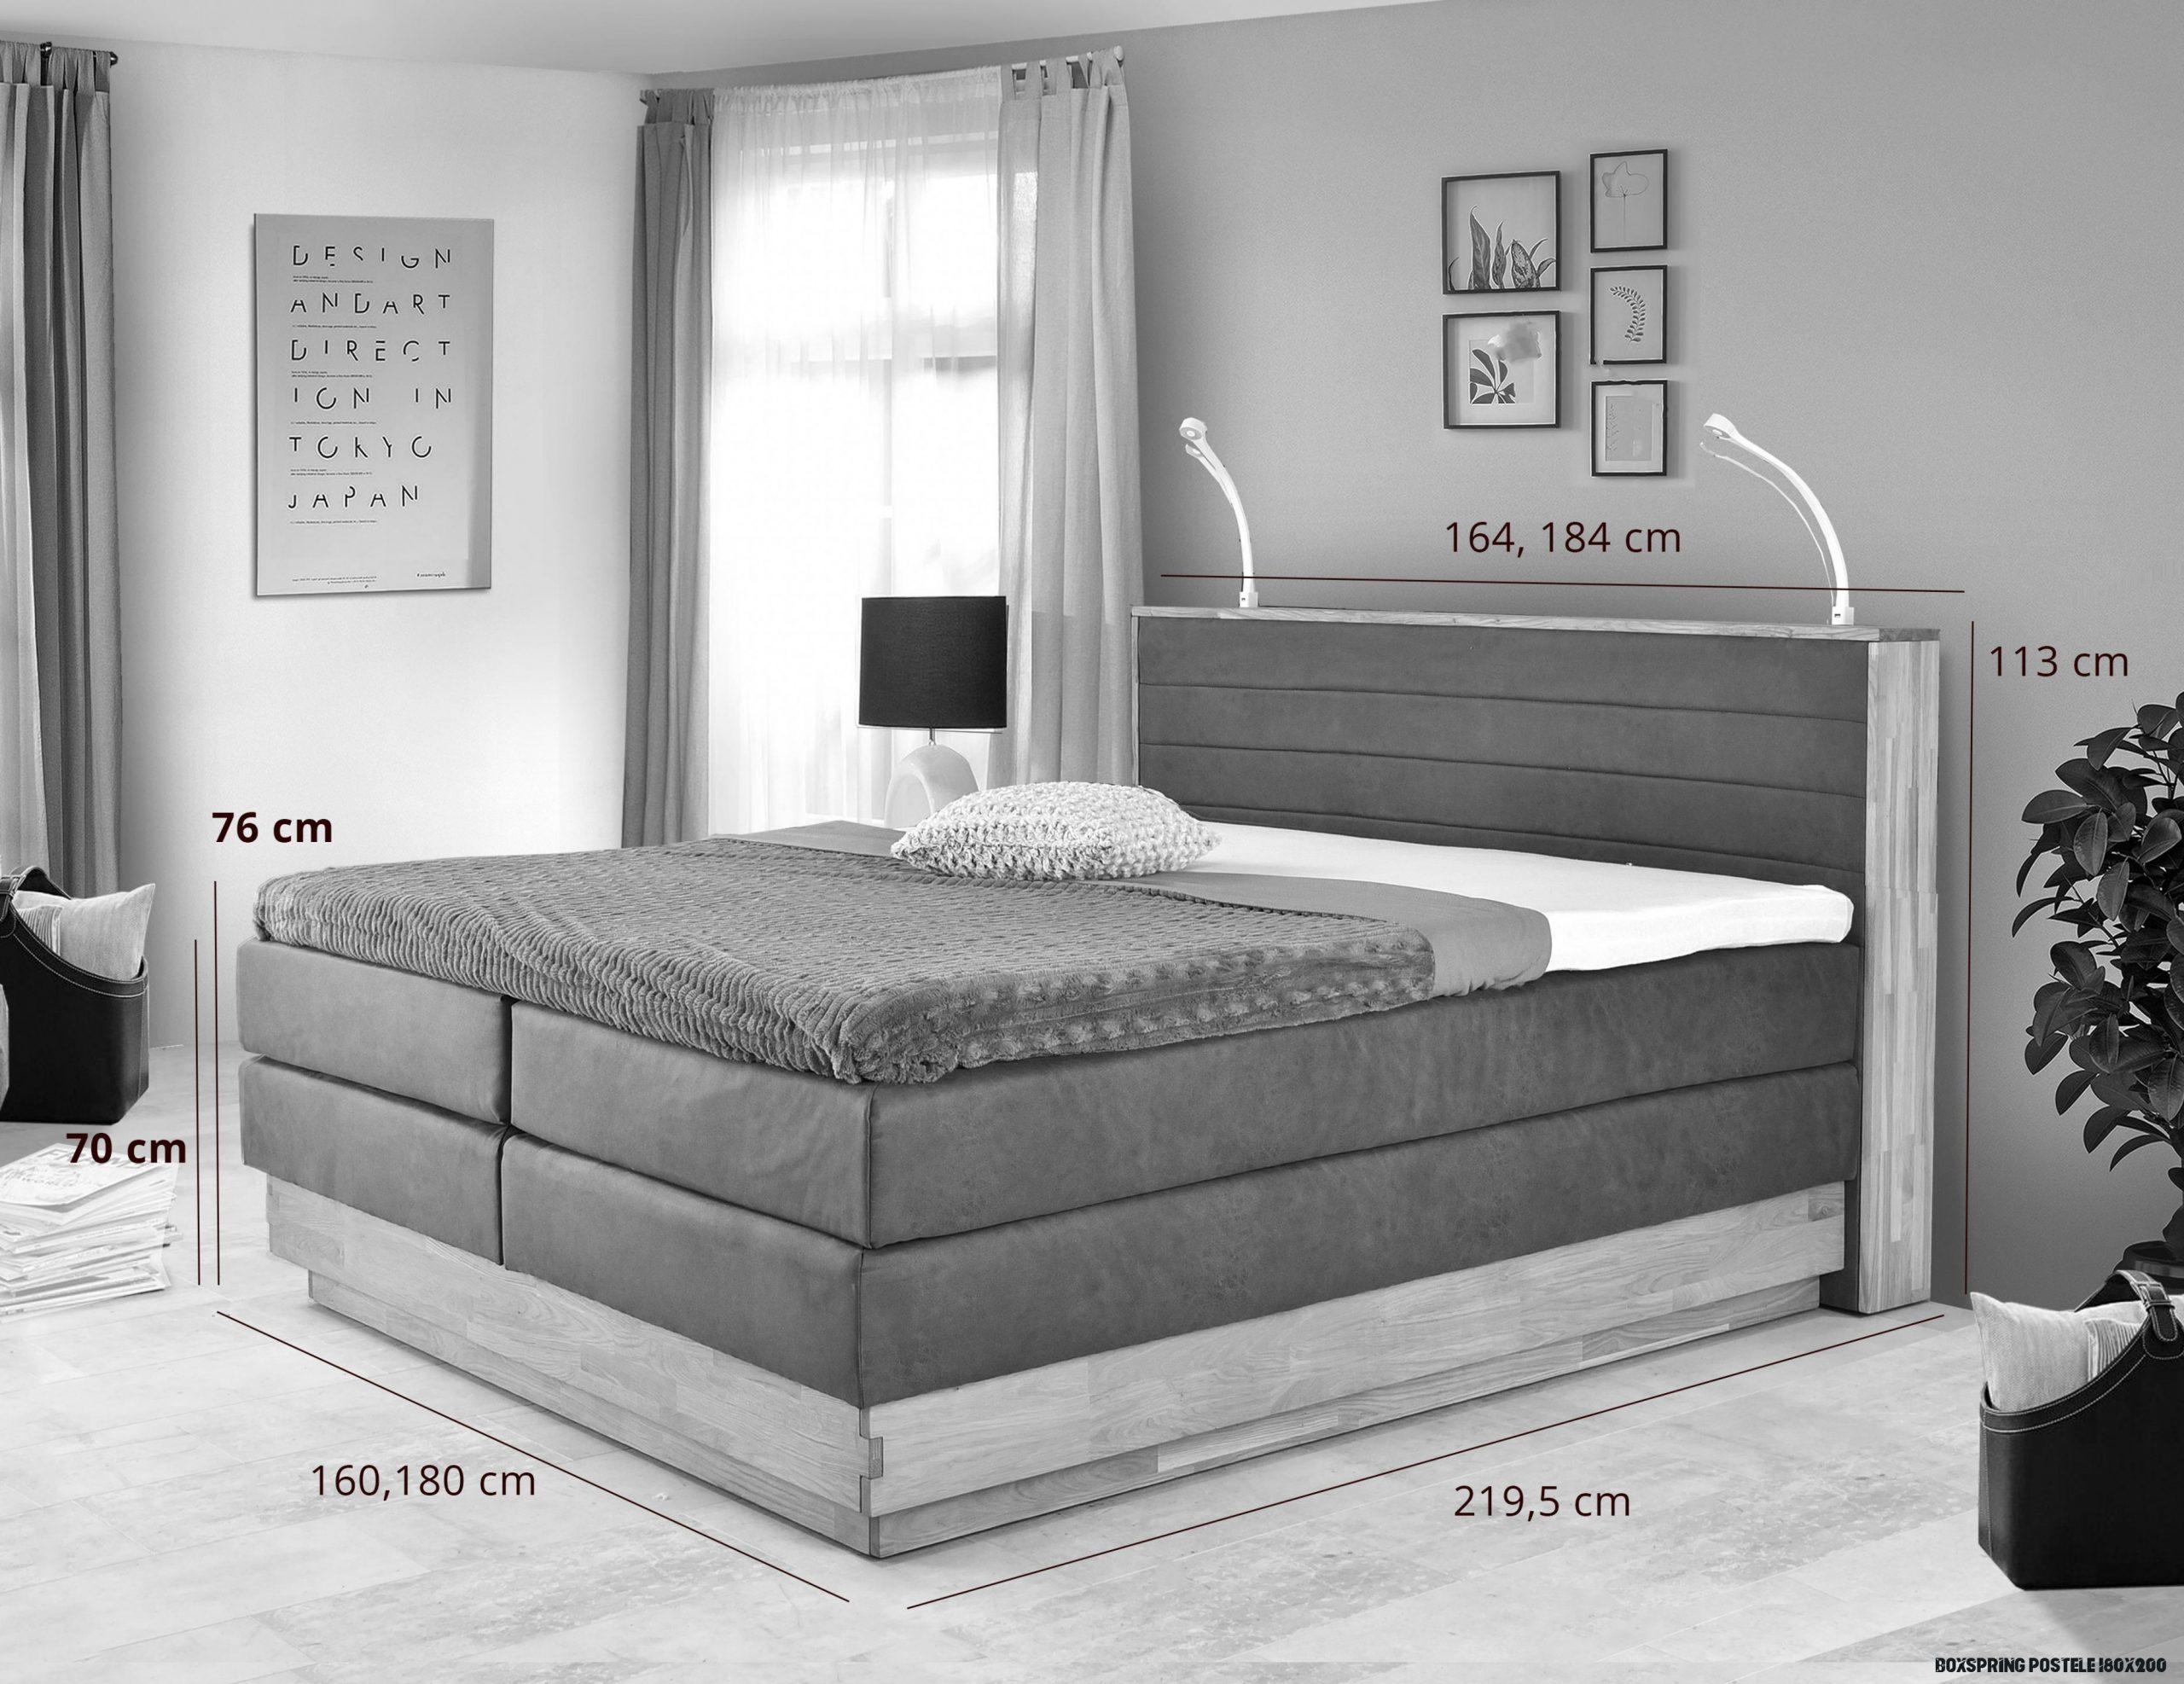 Dubová postel boxspring s úložným prostorem včetně matrací, Moneta 19 -  Nábytek Mirek